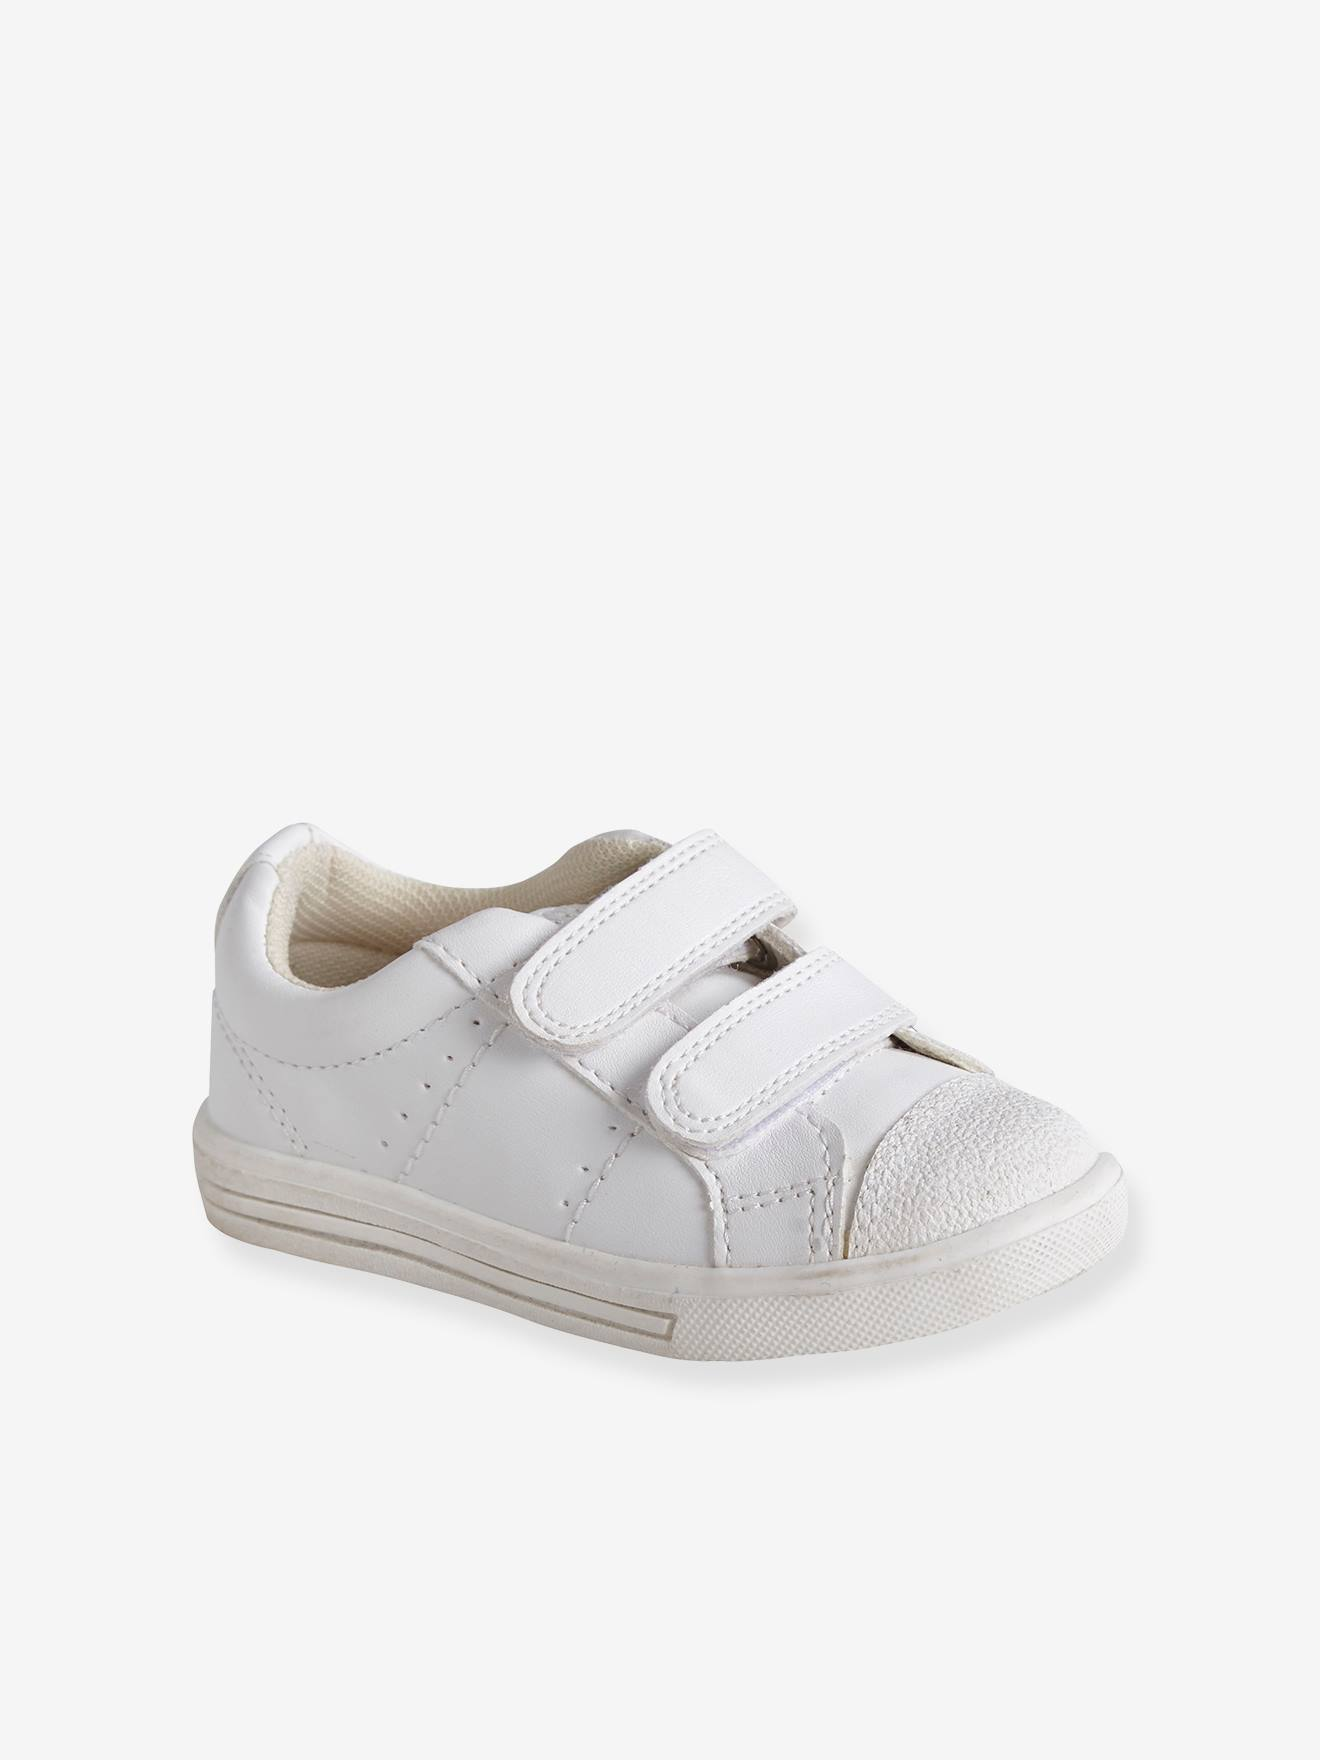 Vertbaudet Sneakers mit Klettverschluss